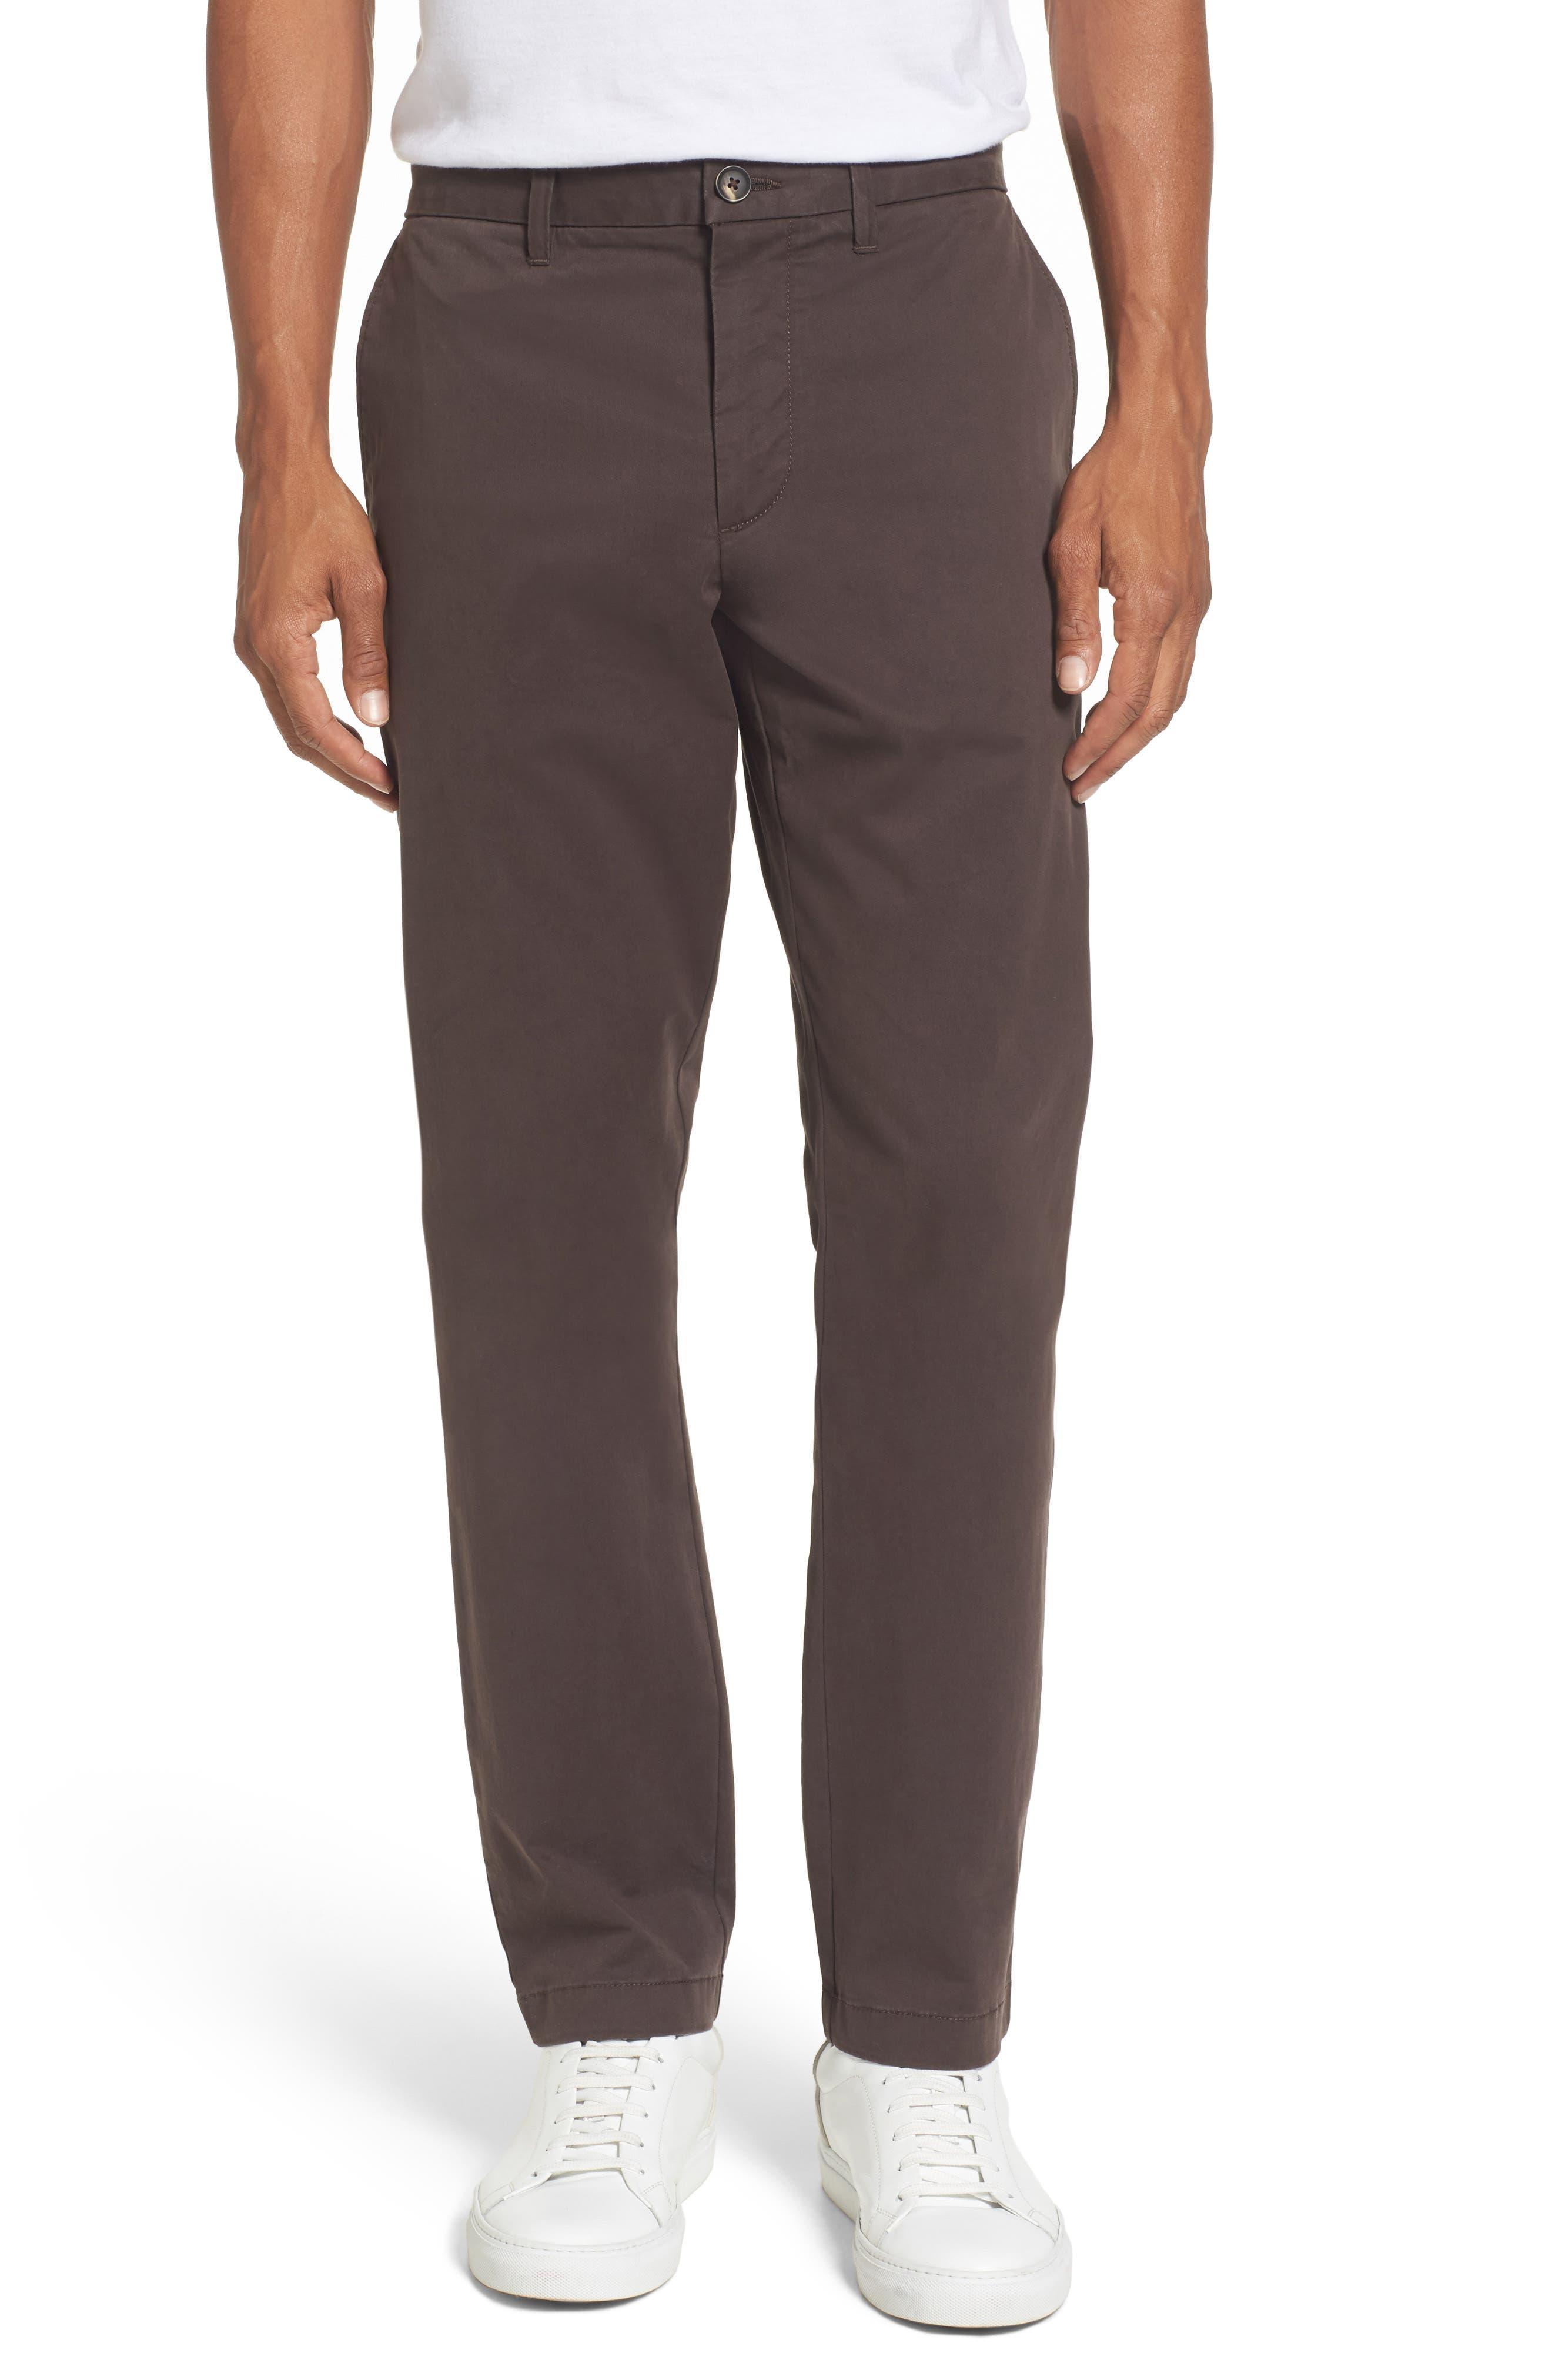 Nordstrom Men's Shop Ballard Slim Fit Stretch Chinos (Regular)